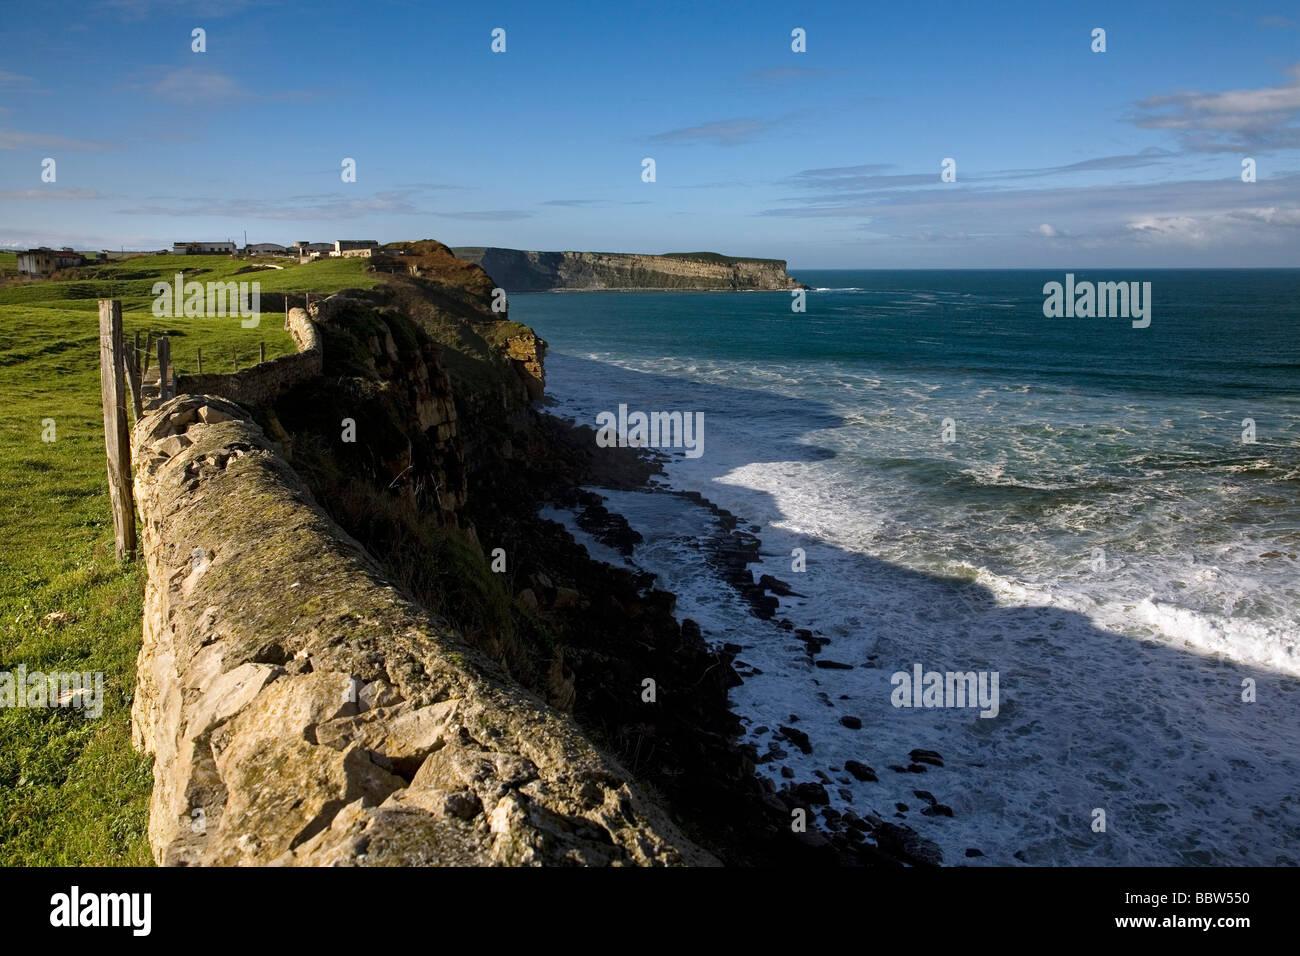 Acantilados y Mar Cantábrico en Suances Cantabria España Cliffs and Cantabrian Sea in Suances Cantabria - Stock Image